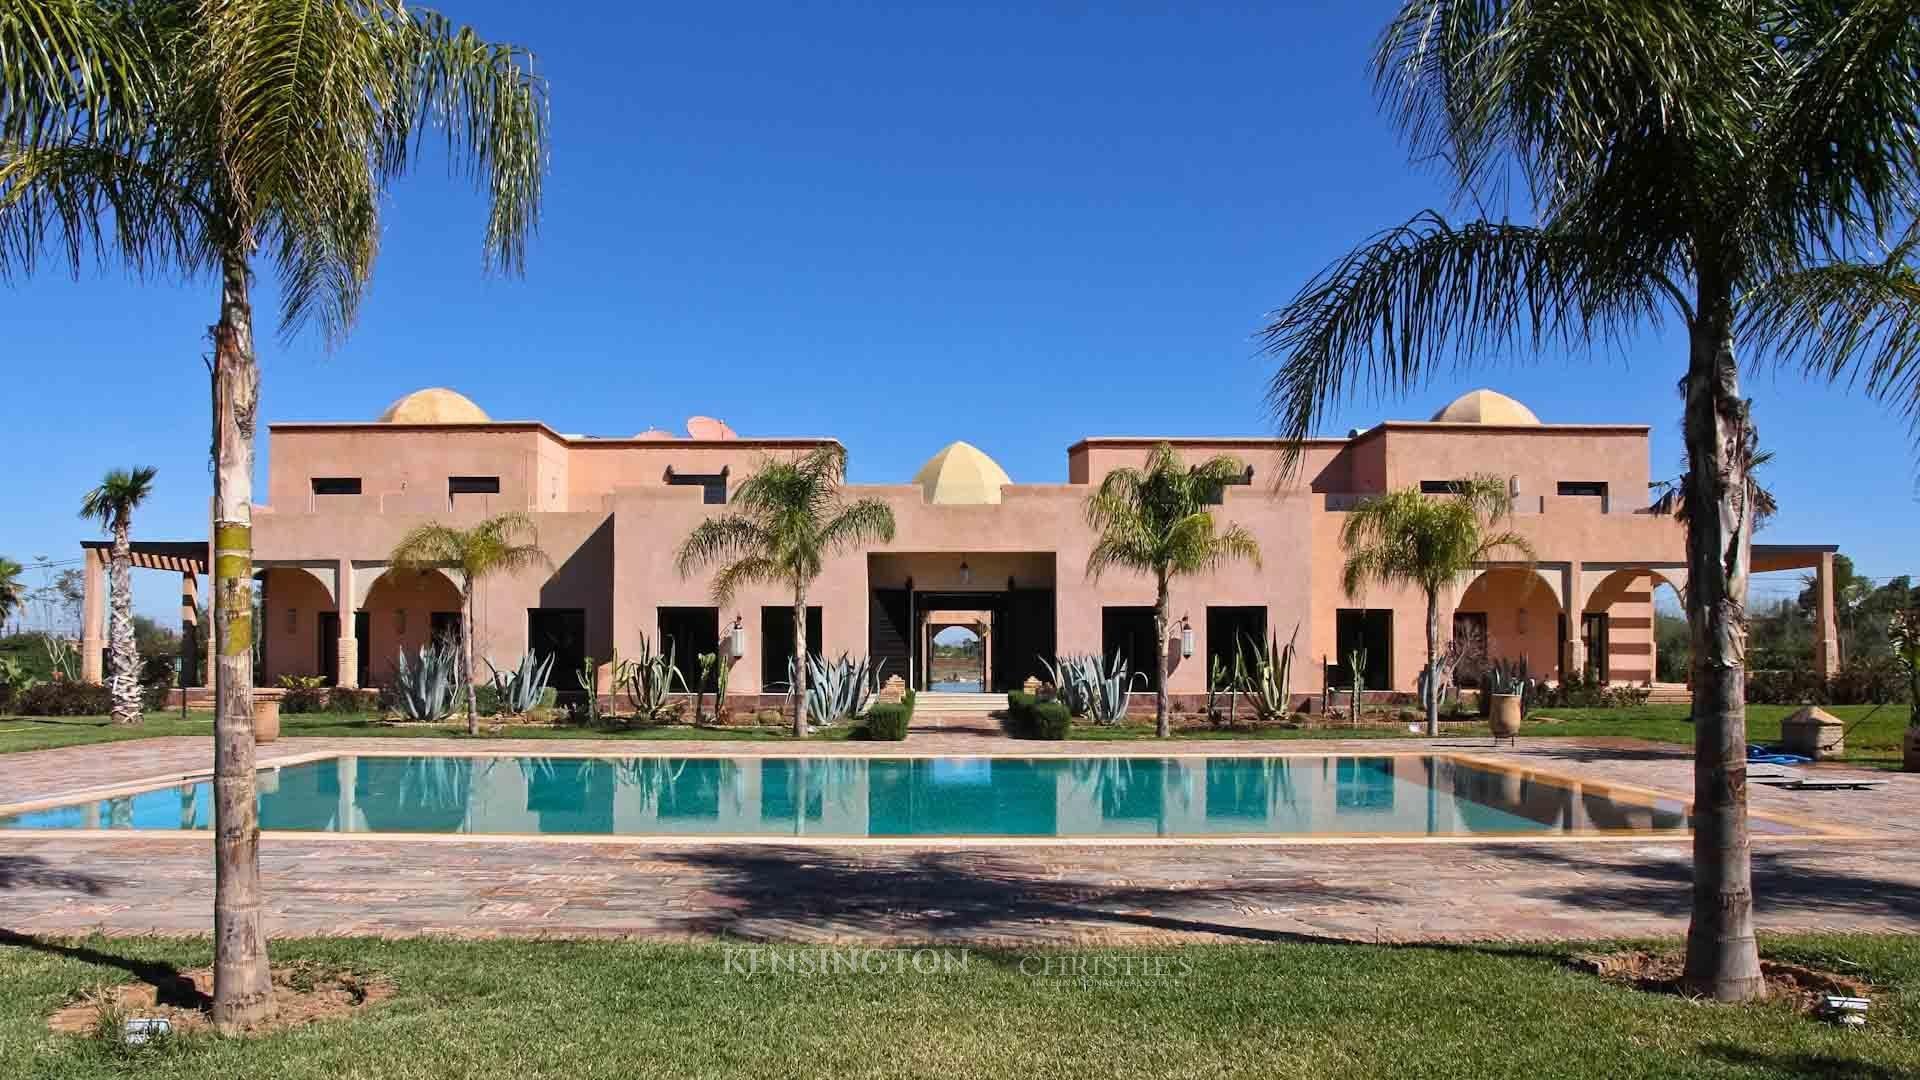 KPPM00967: Villa Lys Luxury Villa Marrakech Morocco